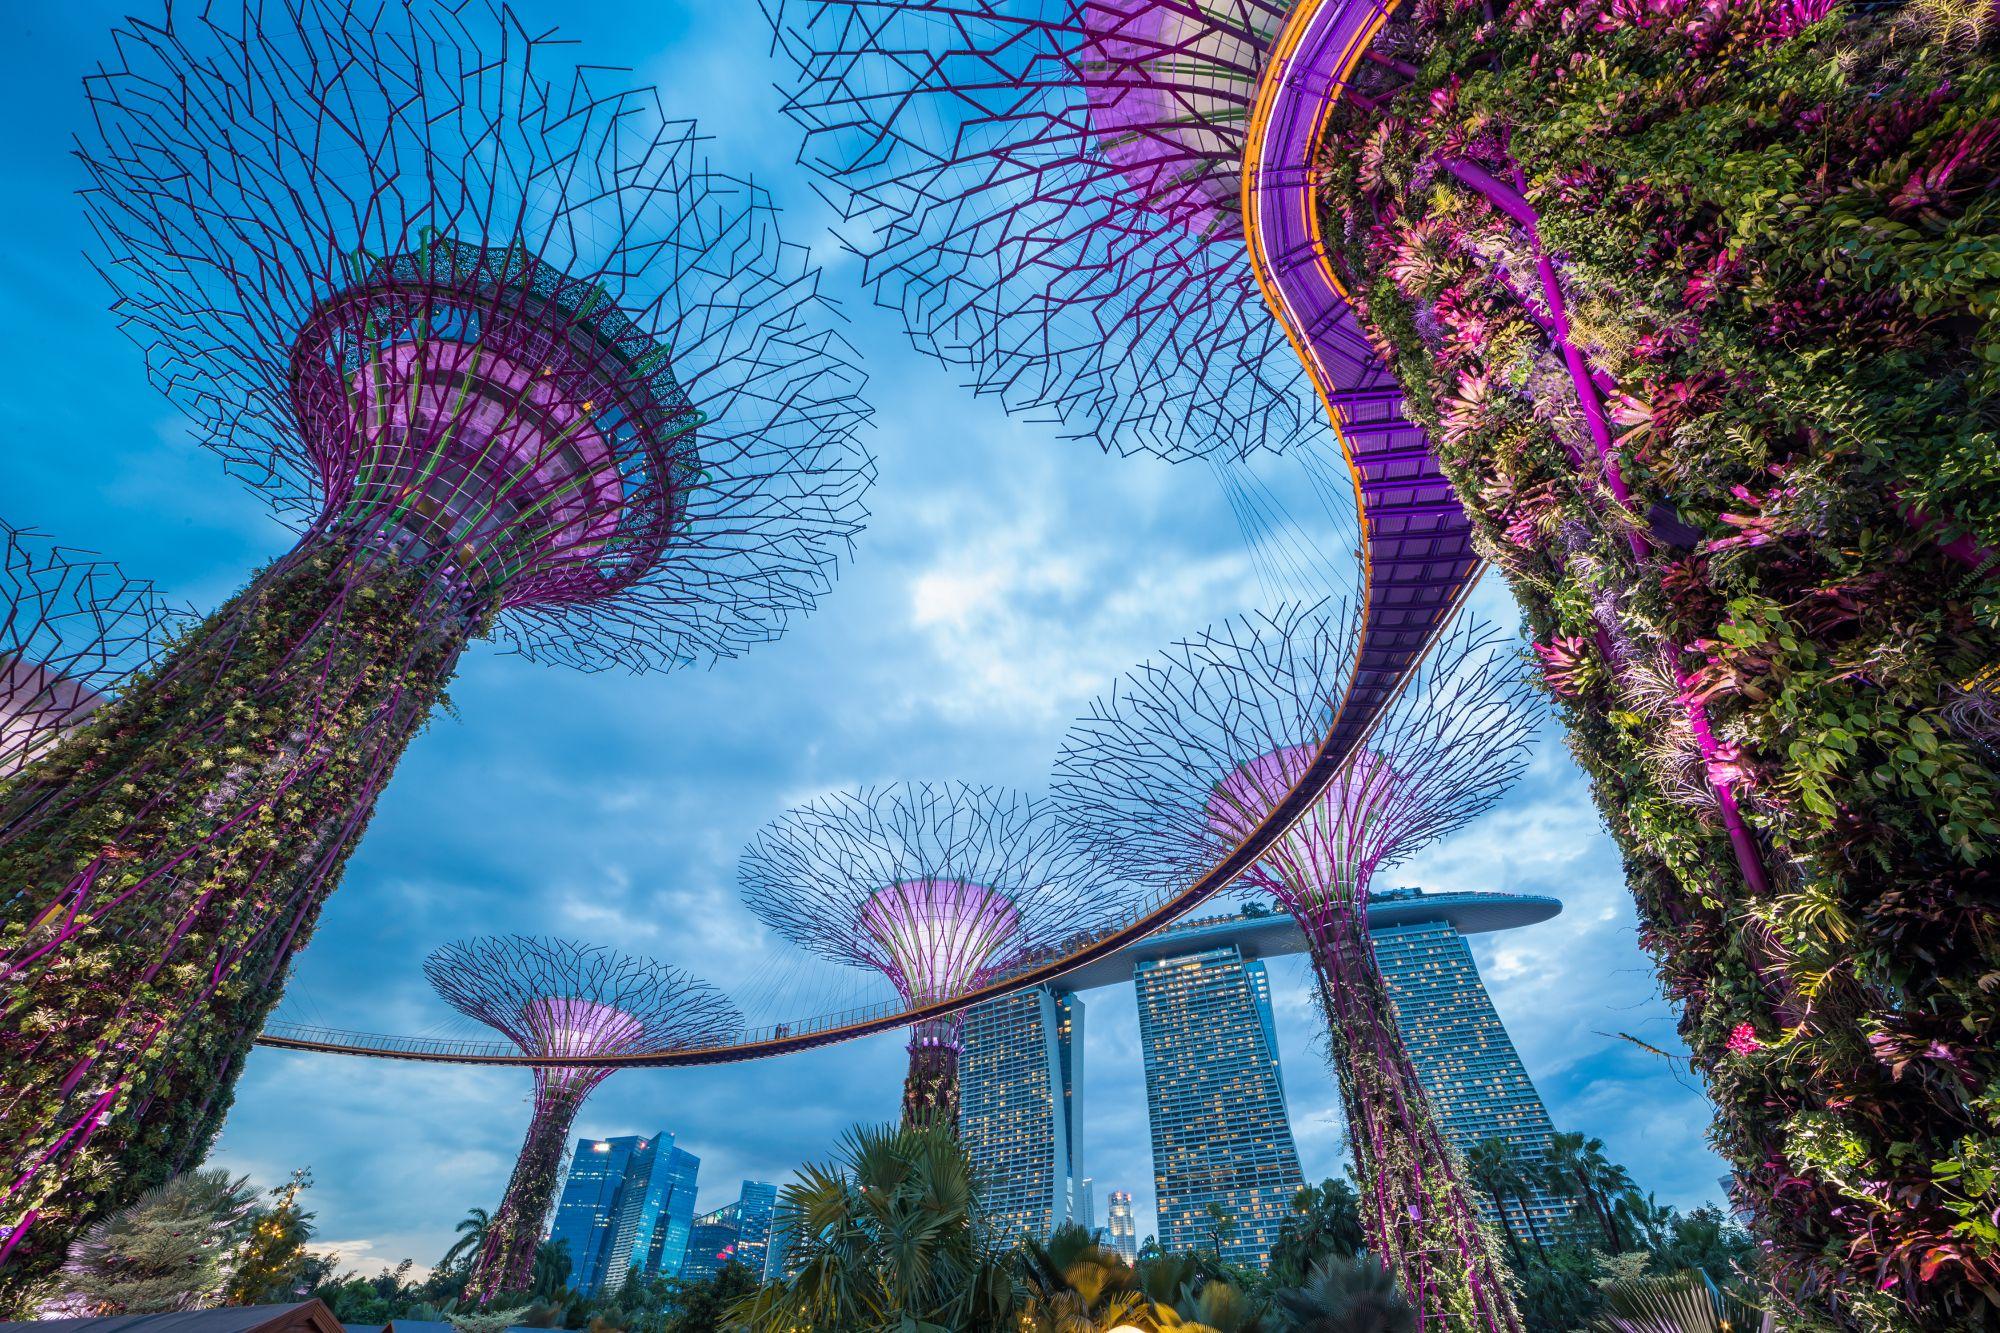 Singapur ogród miejski